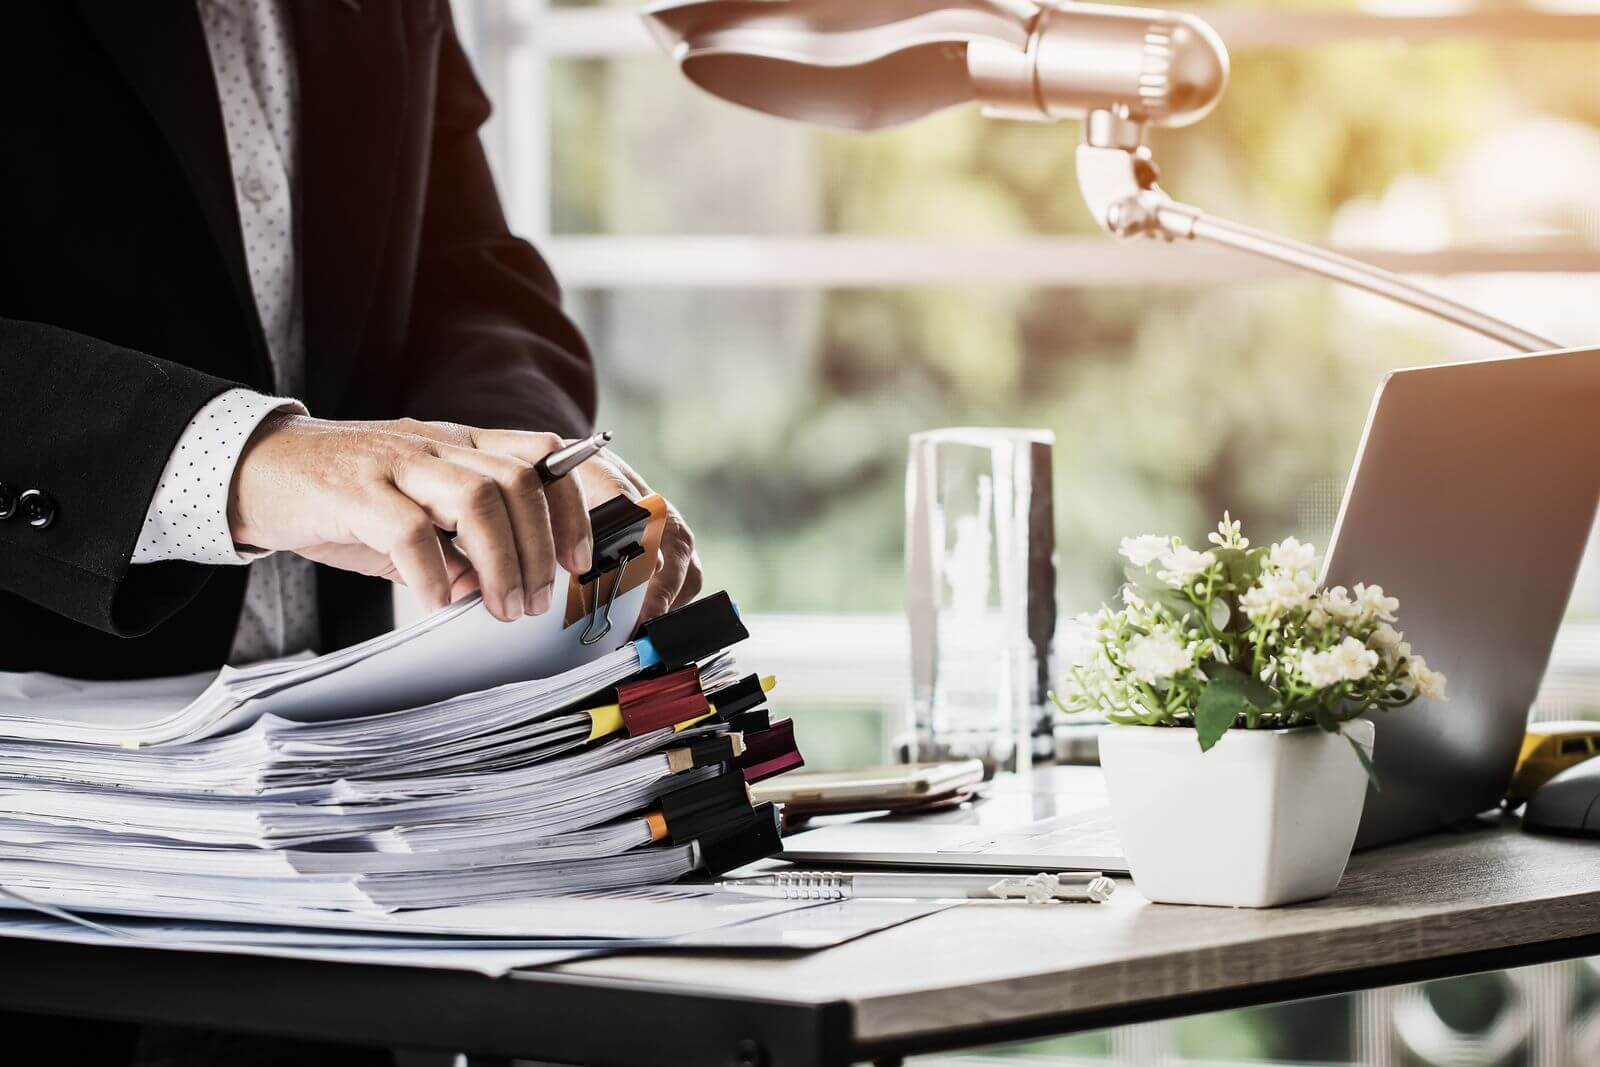 Man organizing desk